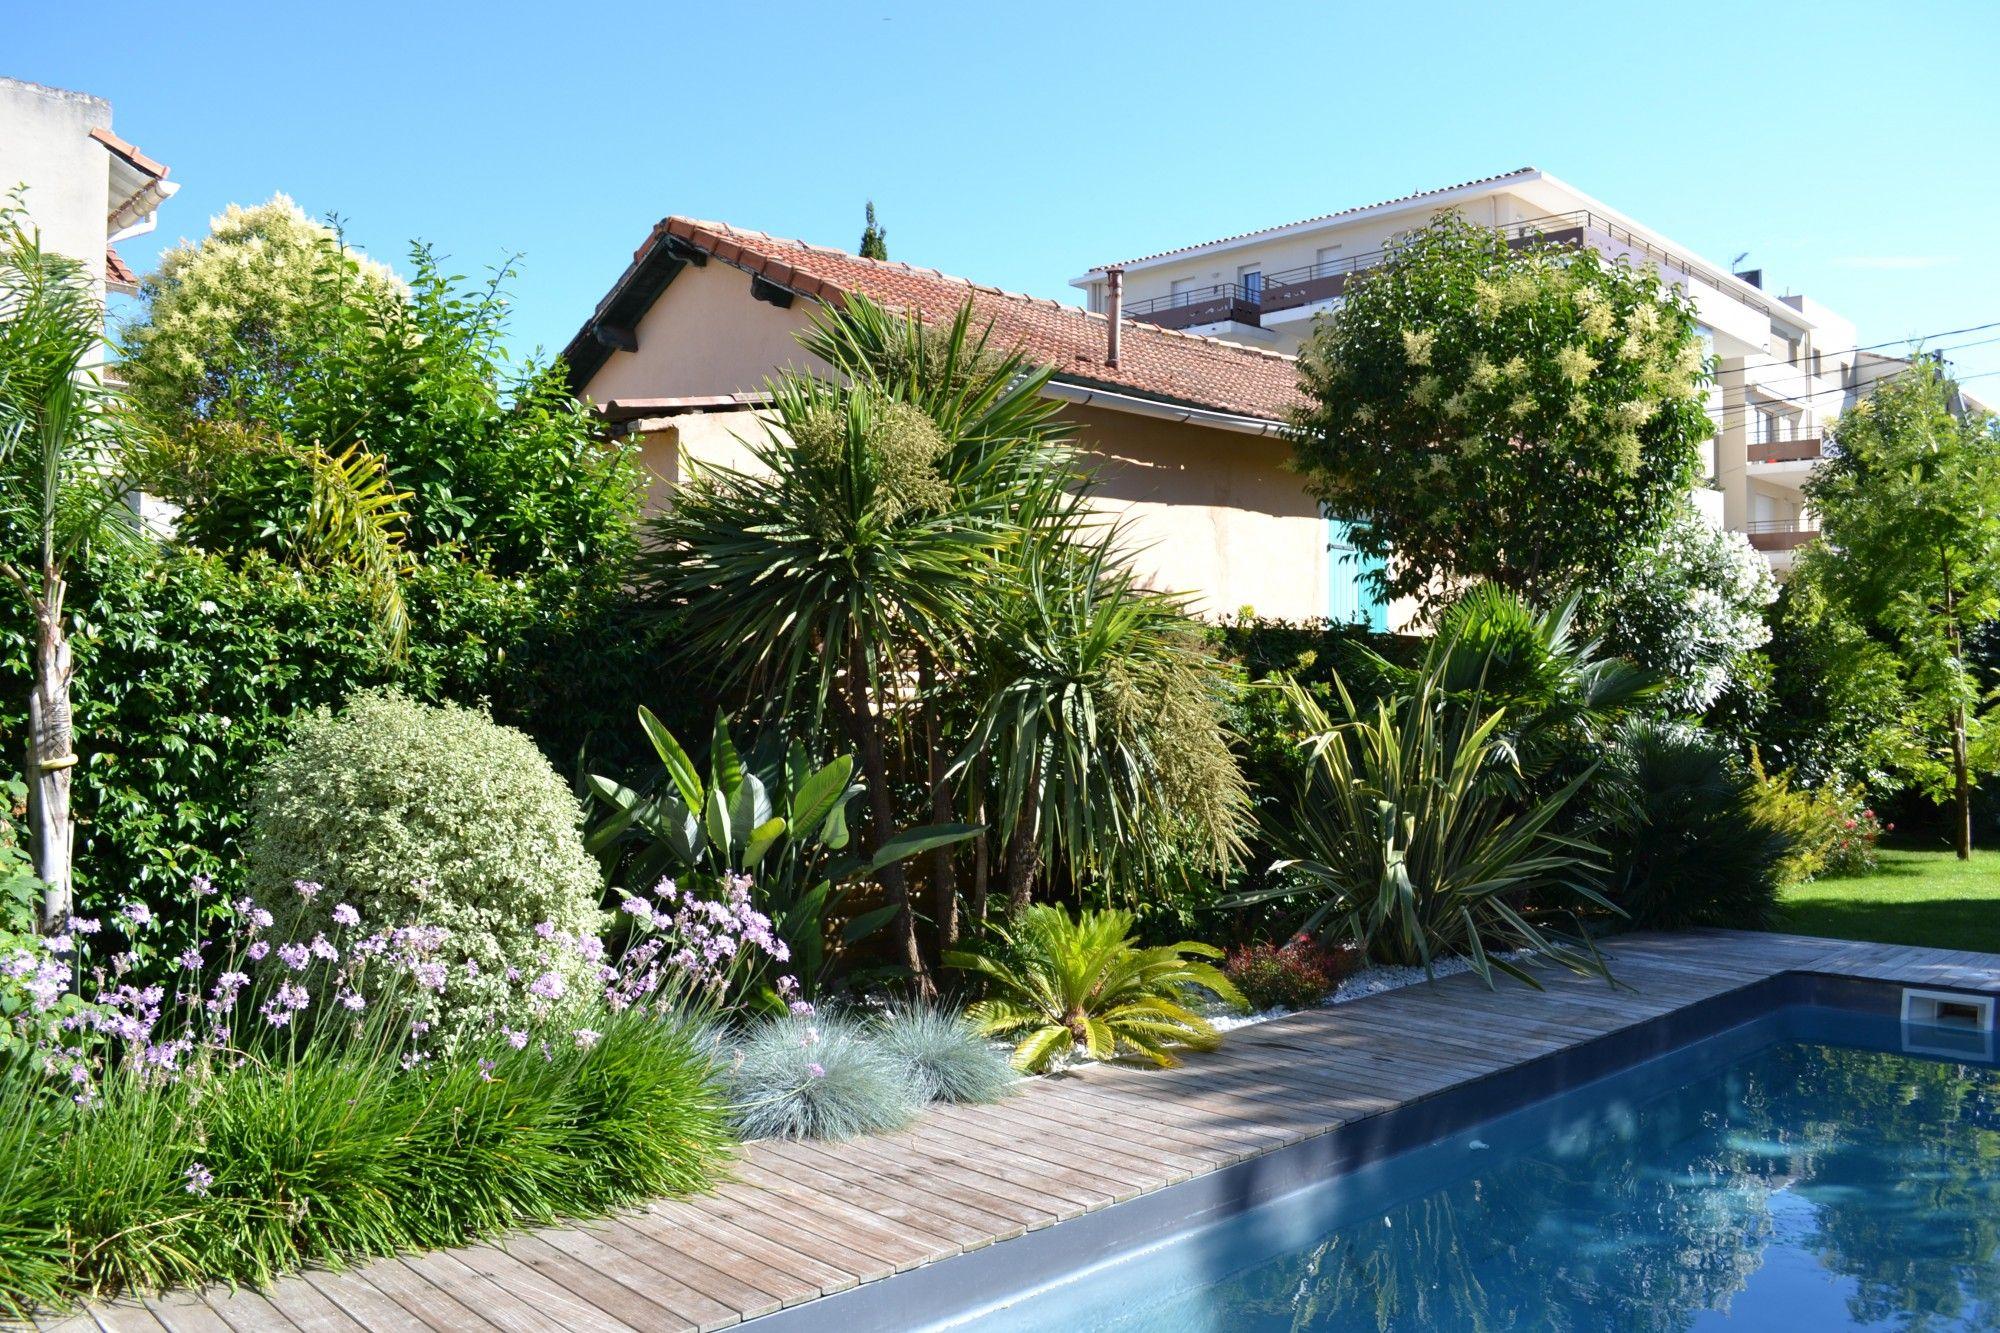 Amenagement Jardin Avec Piscine Bois amenagement jardin paysager piscine terrasse en bois